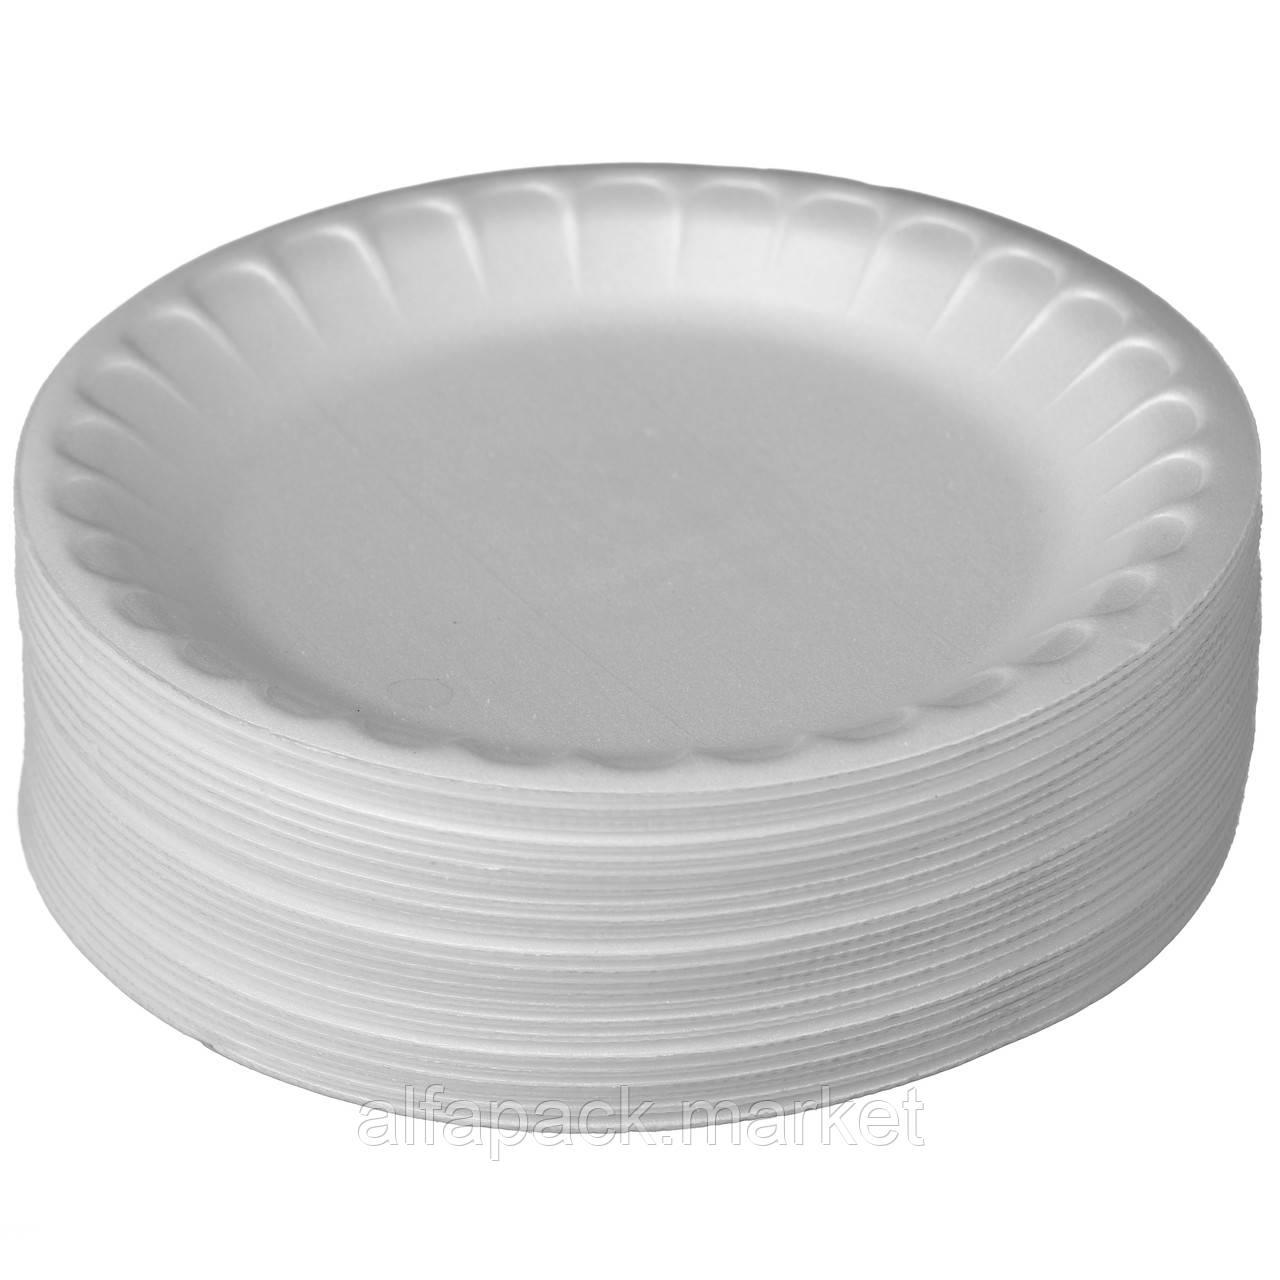 Набор одноразовой посуды Food Packing  Тарелка ВПС Десертная 170 мм 25 персон 000001969